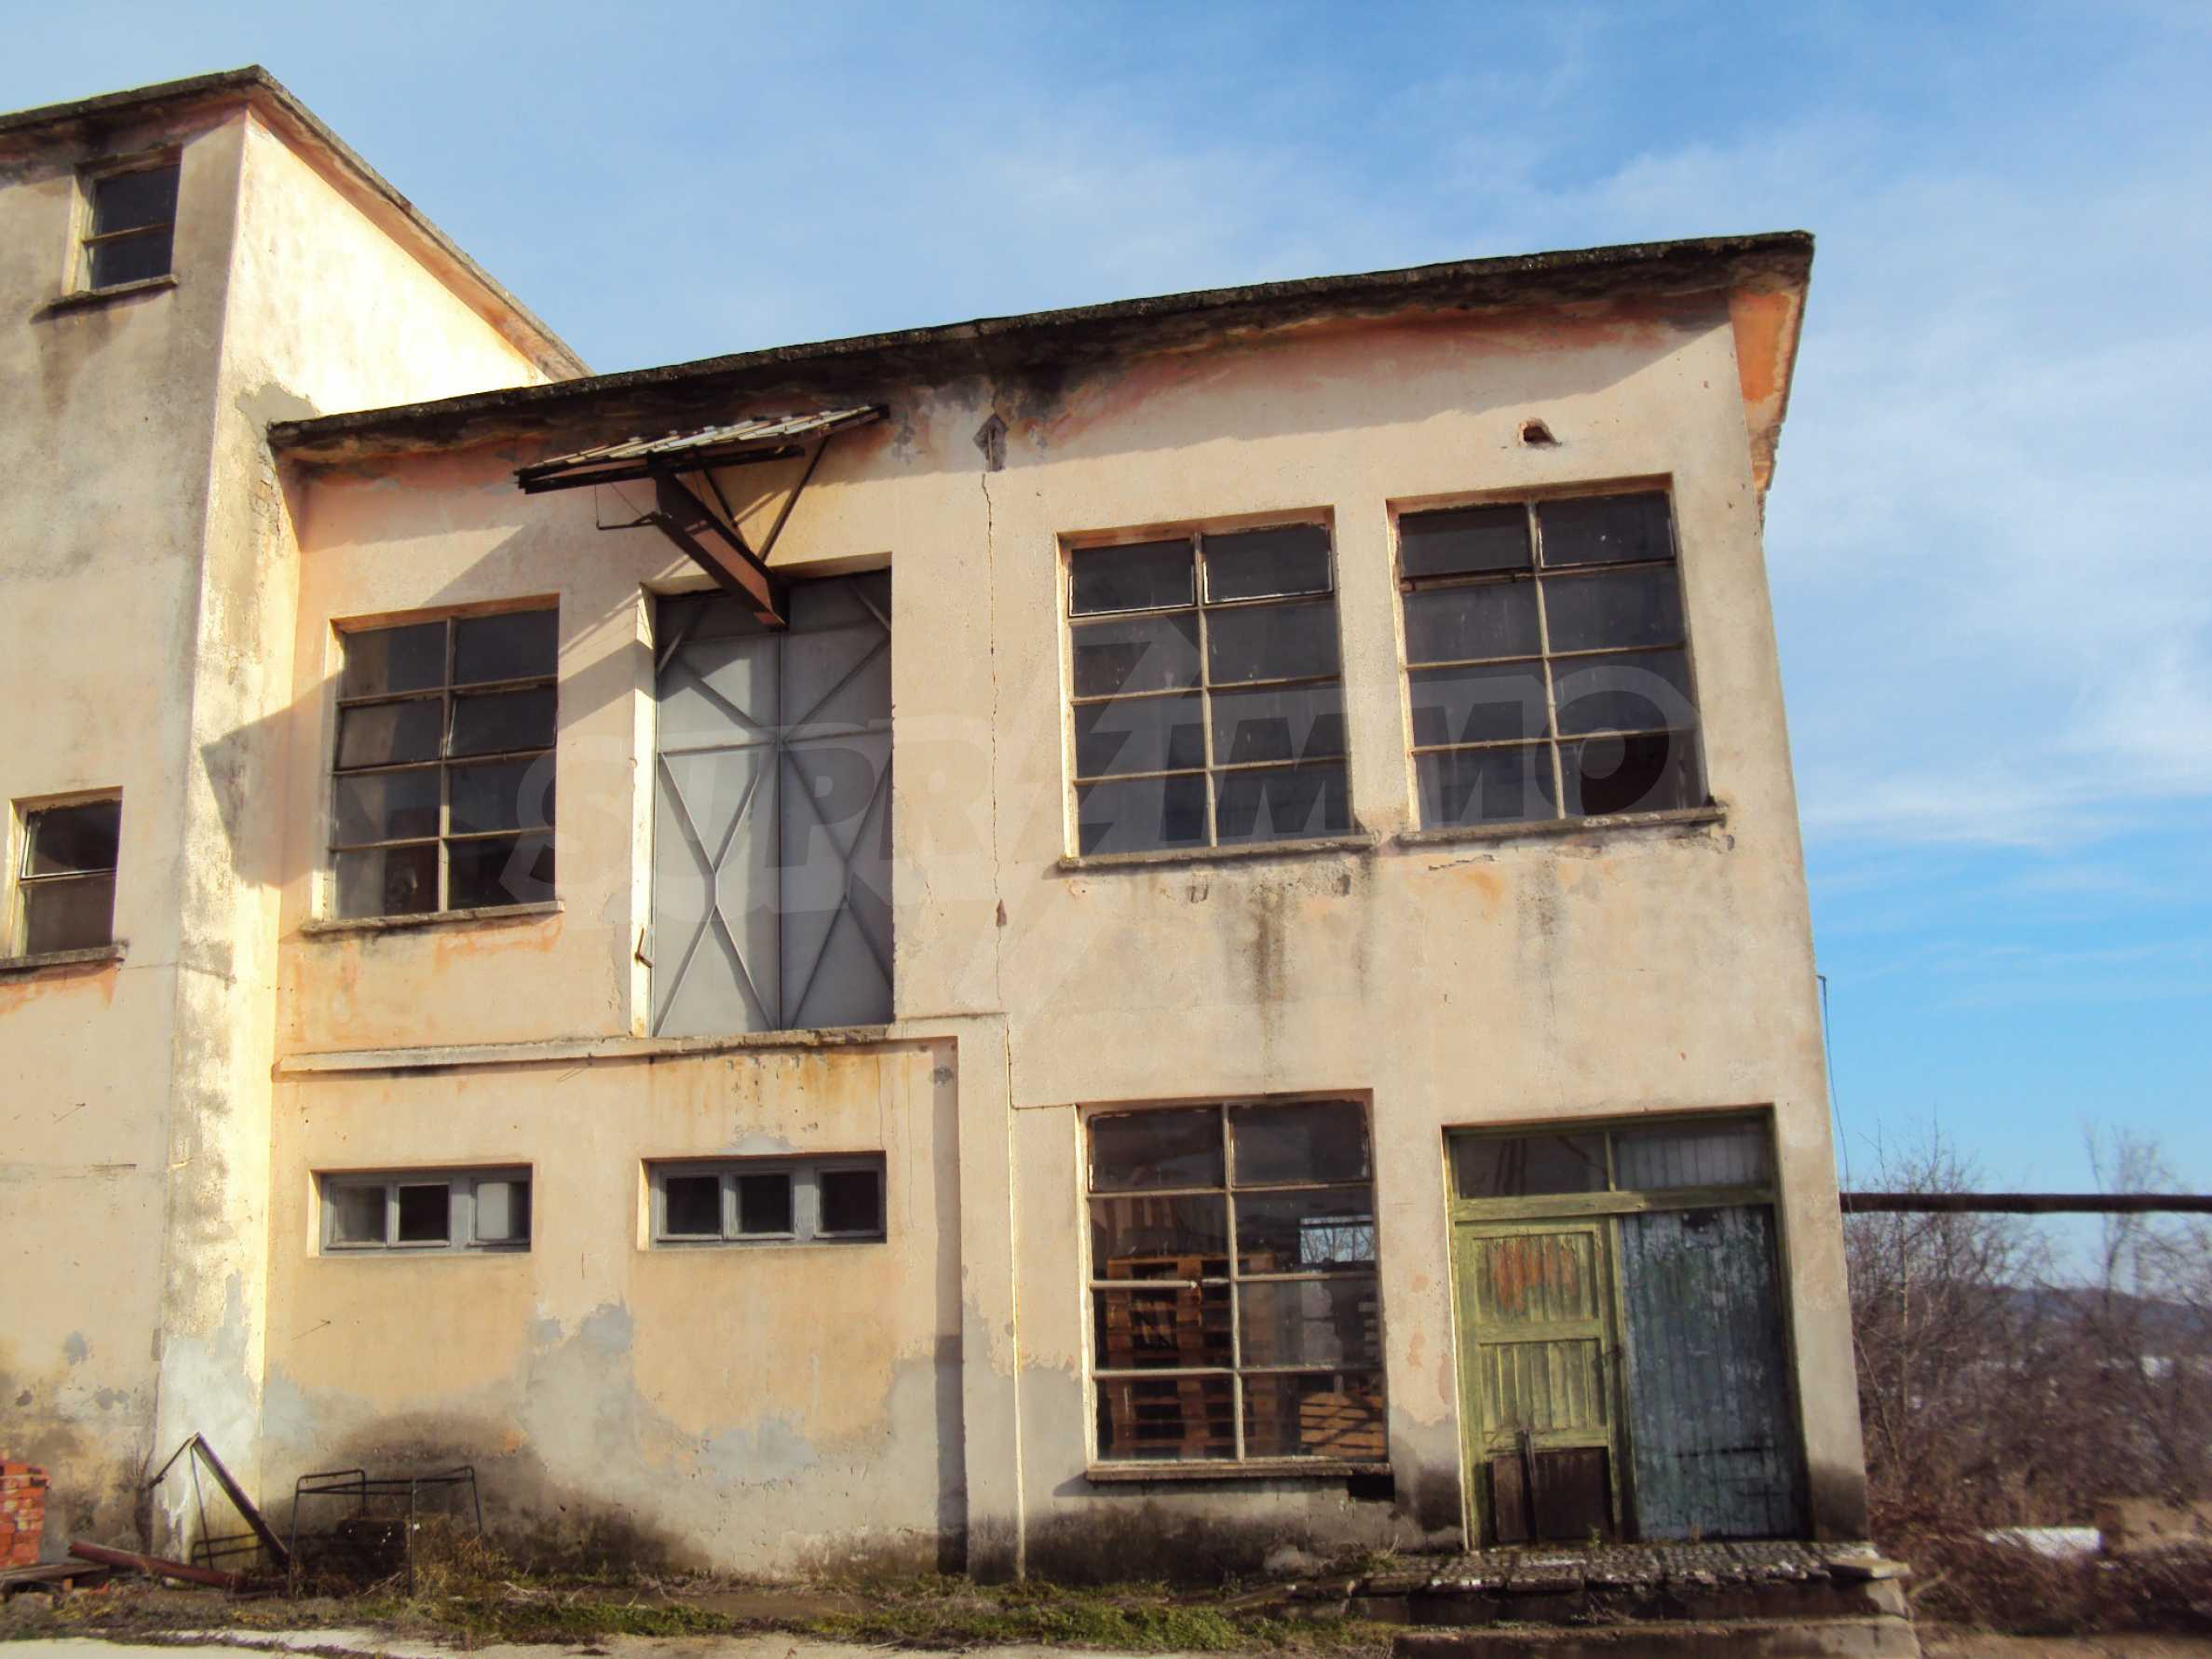 Fabrik in der Nähe von Veliko Tarnovo 30